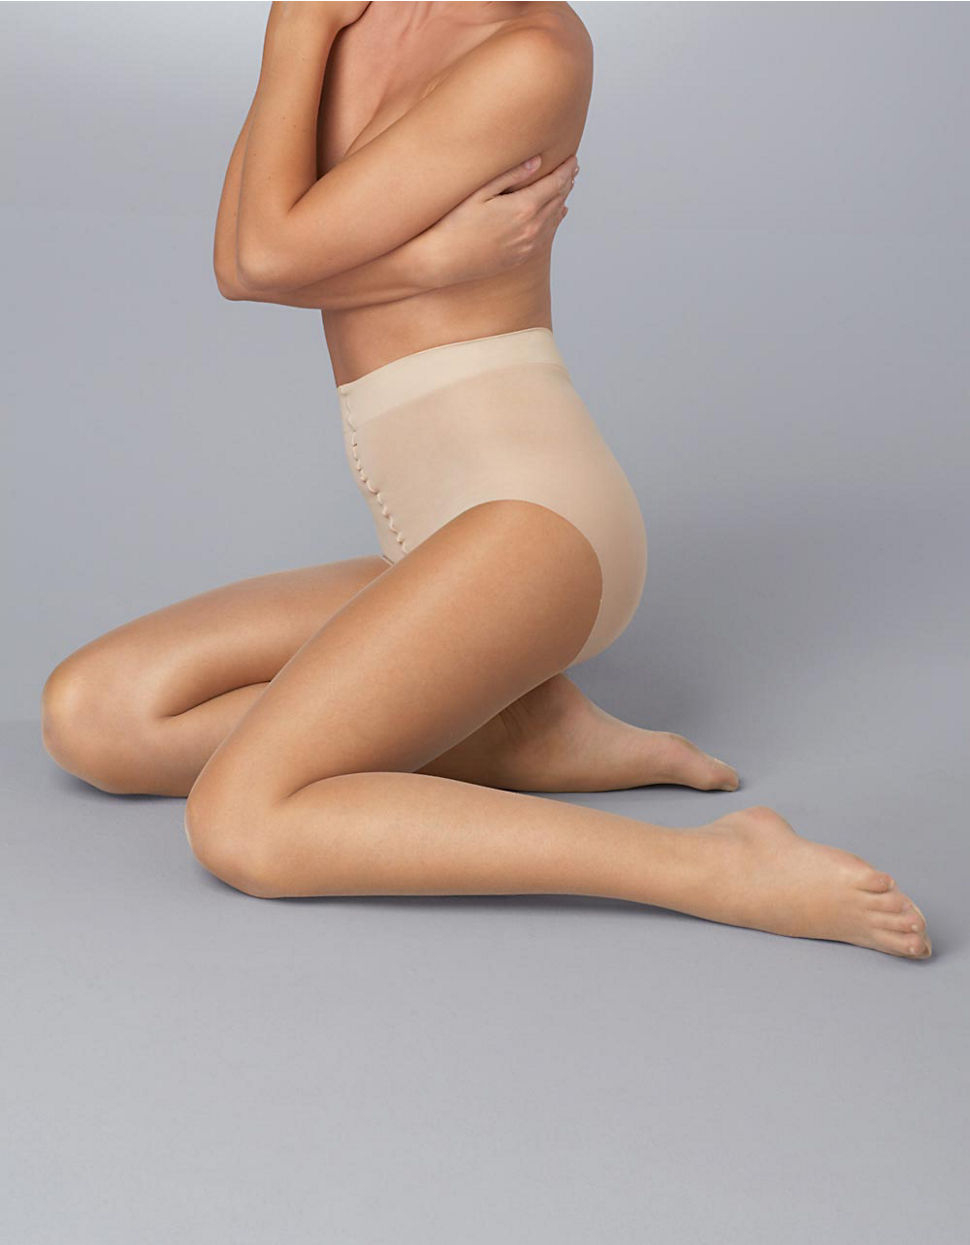 90baa36d9 Donna Karan Nude Control Top Sheer Hosiery in Natural - Lyst